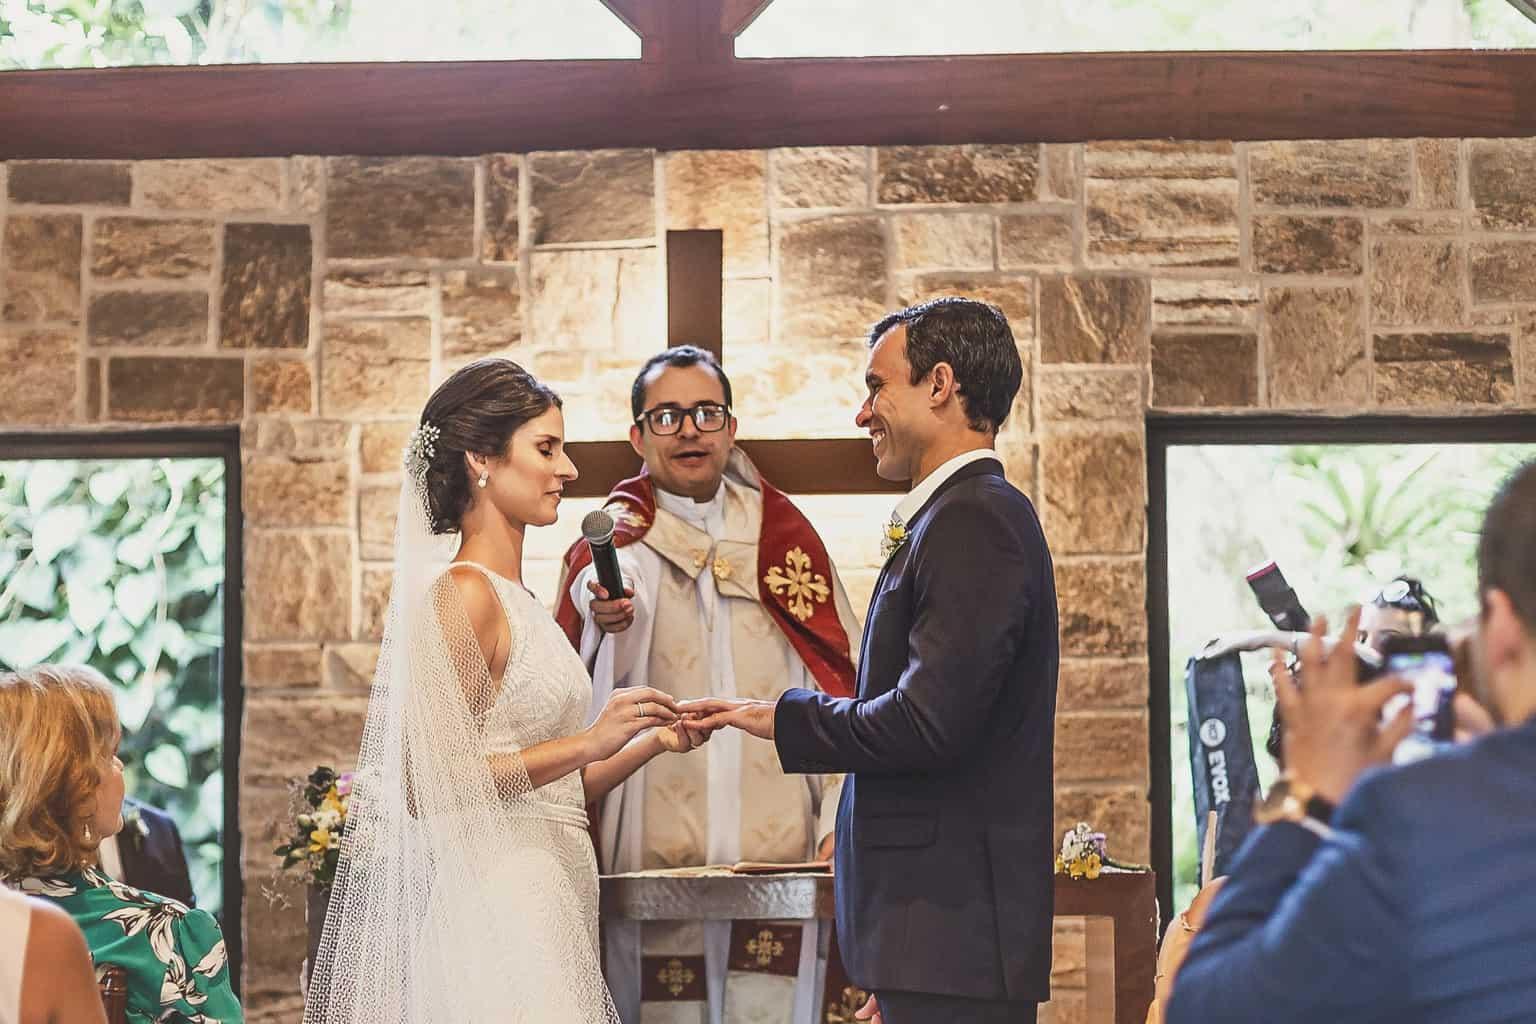 casamento-Ana-Cecilia-e-Leonardo-casamento-na-serra-cerimonia-graviola-filmes-graviolafilmes-laura-camapnella-de-siervi-lauracampanella-studio-laura-camapnella23